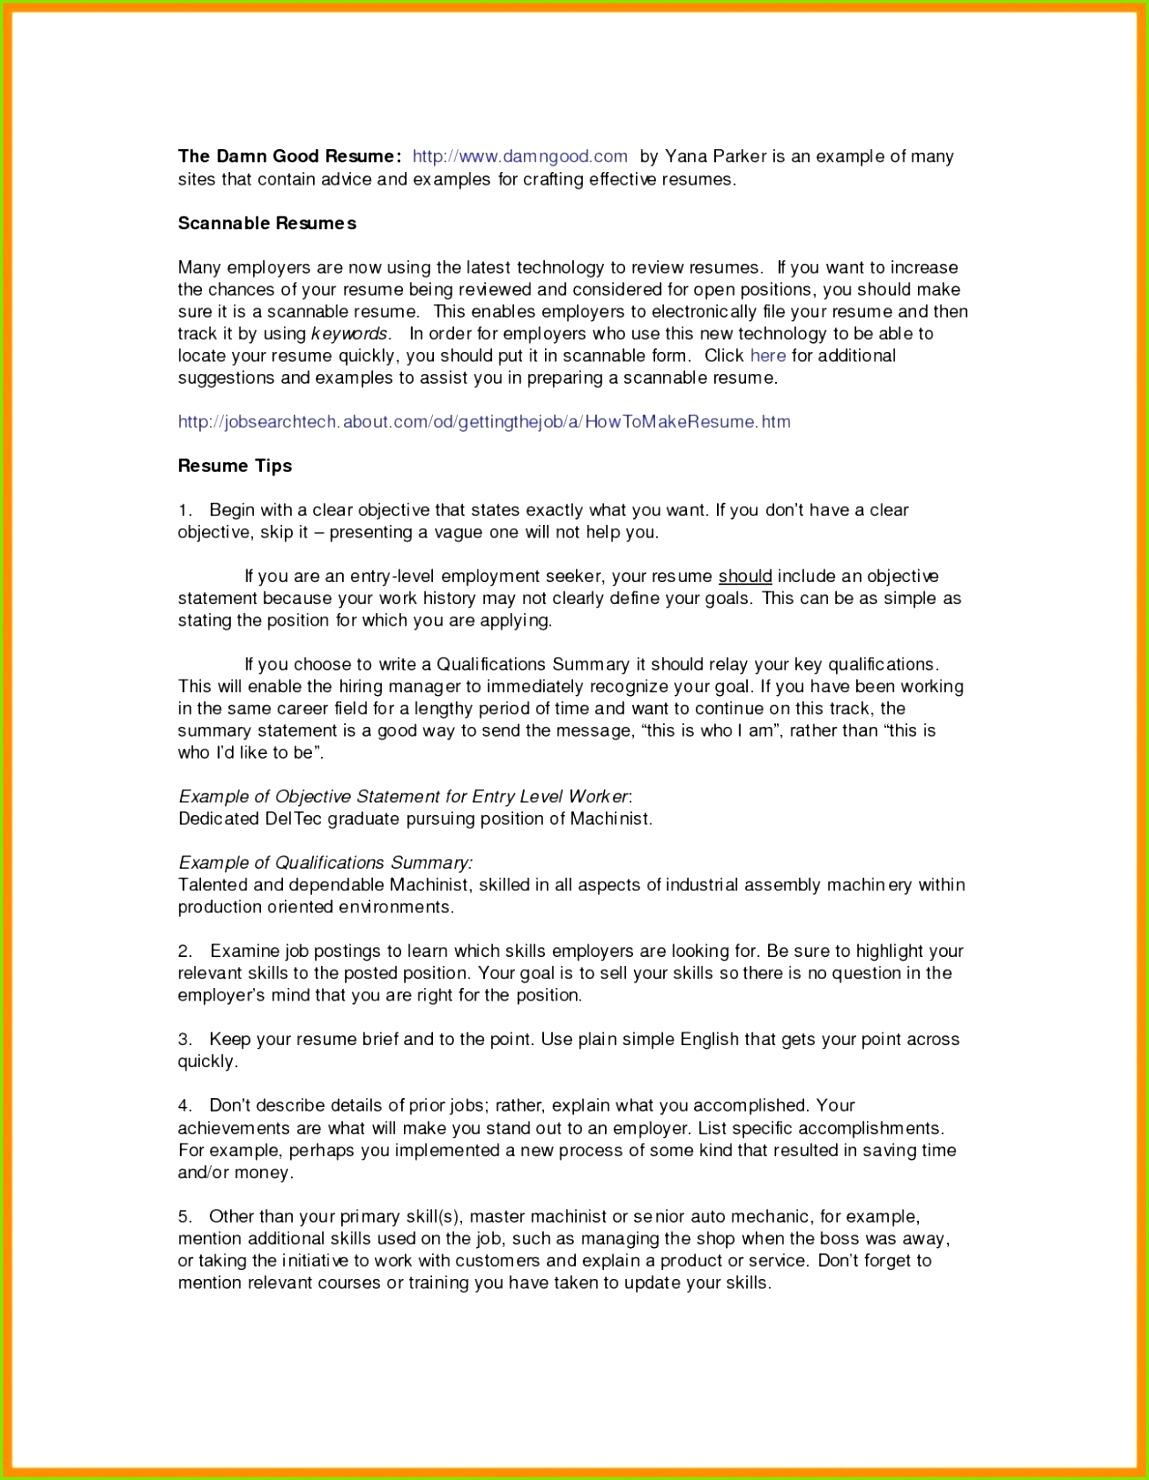 Electronic Technician Resume Sample Pdf New Free Downloads Electronic Technician Resume Objective Vcuregistry